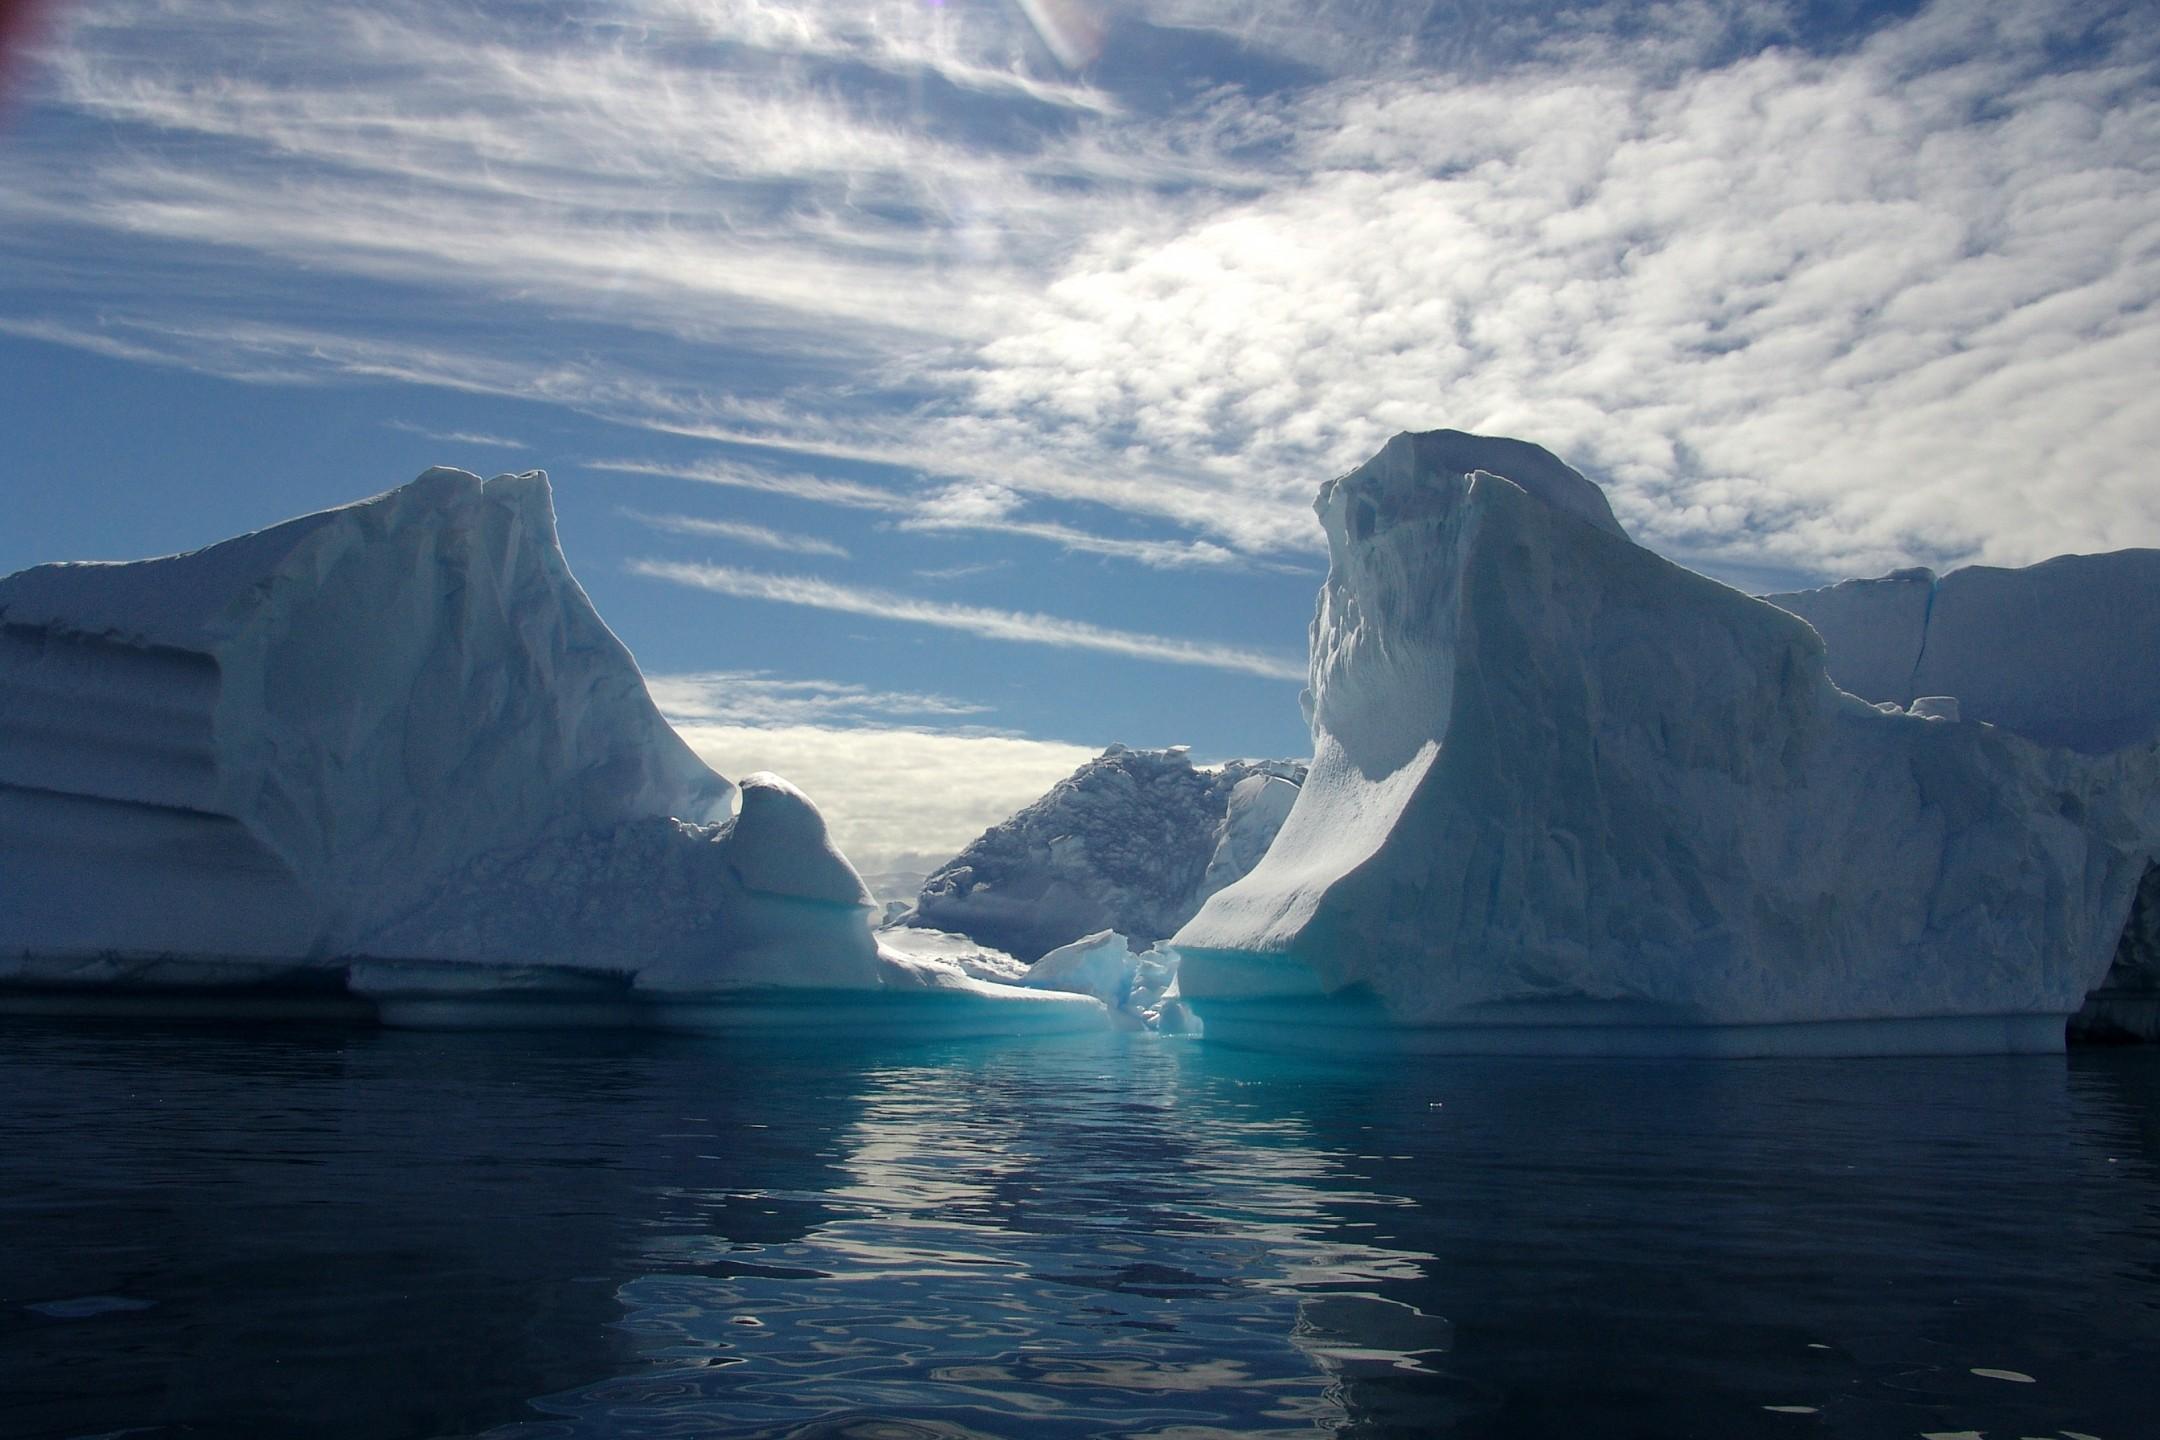 zeespiegel stijgt harder dan verwacht